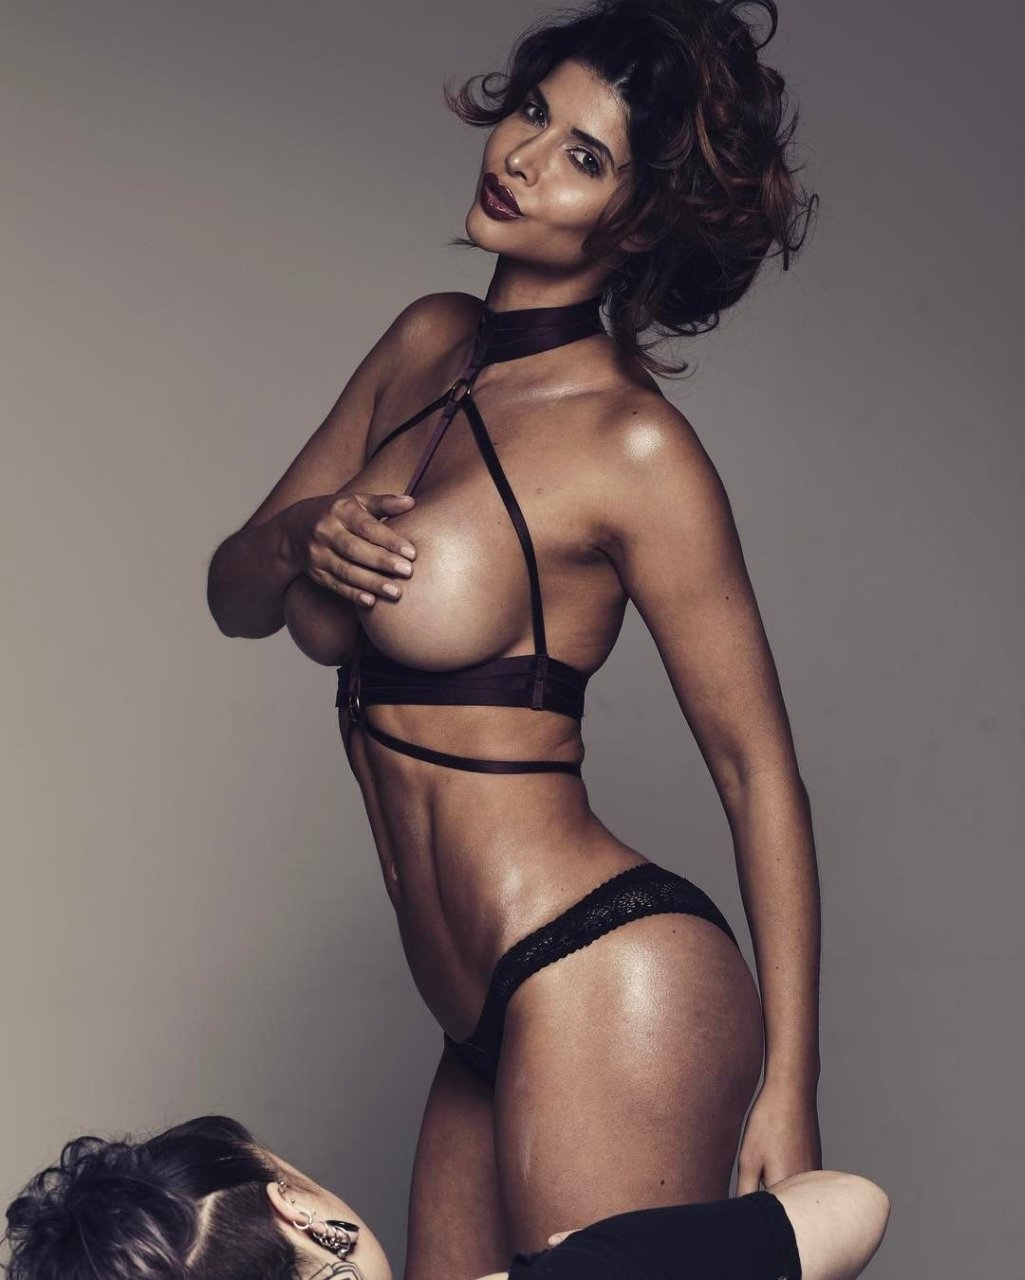 ADULT Lois Chiles nude (18 photo), Cleavage Celebrites photo